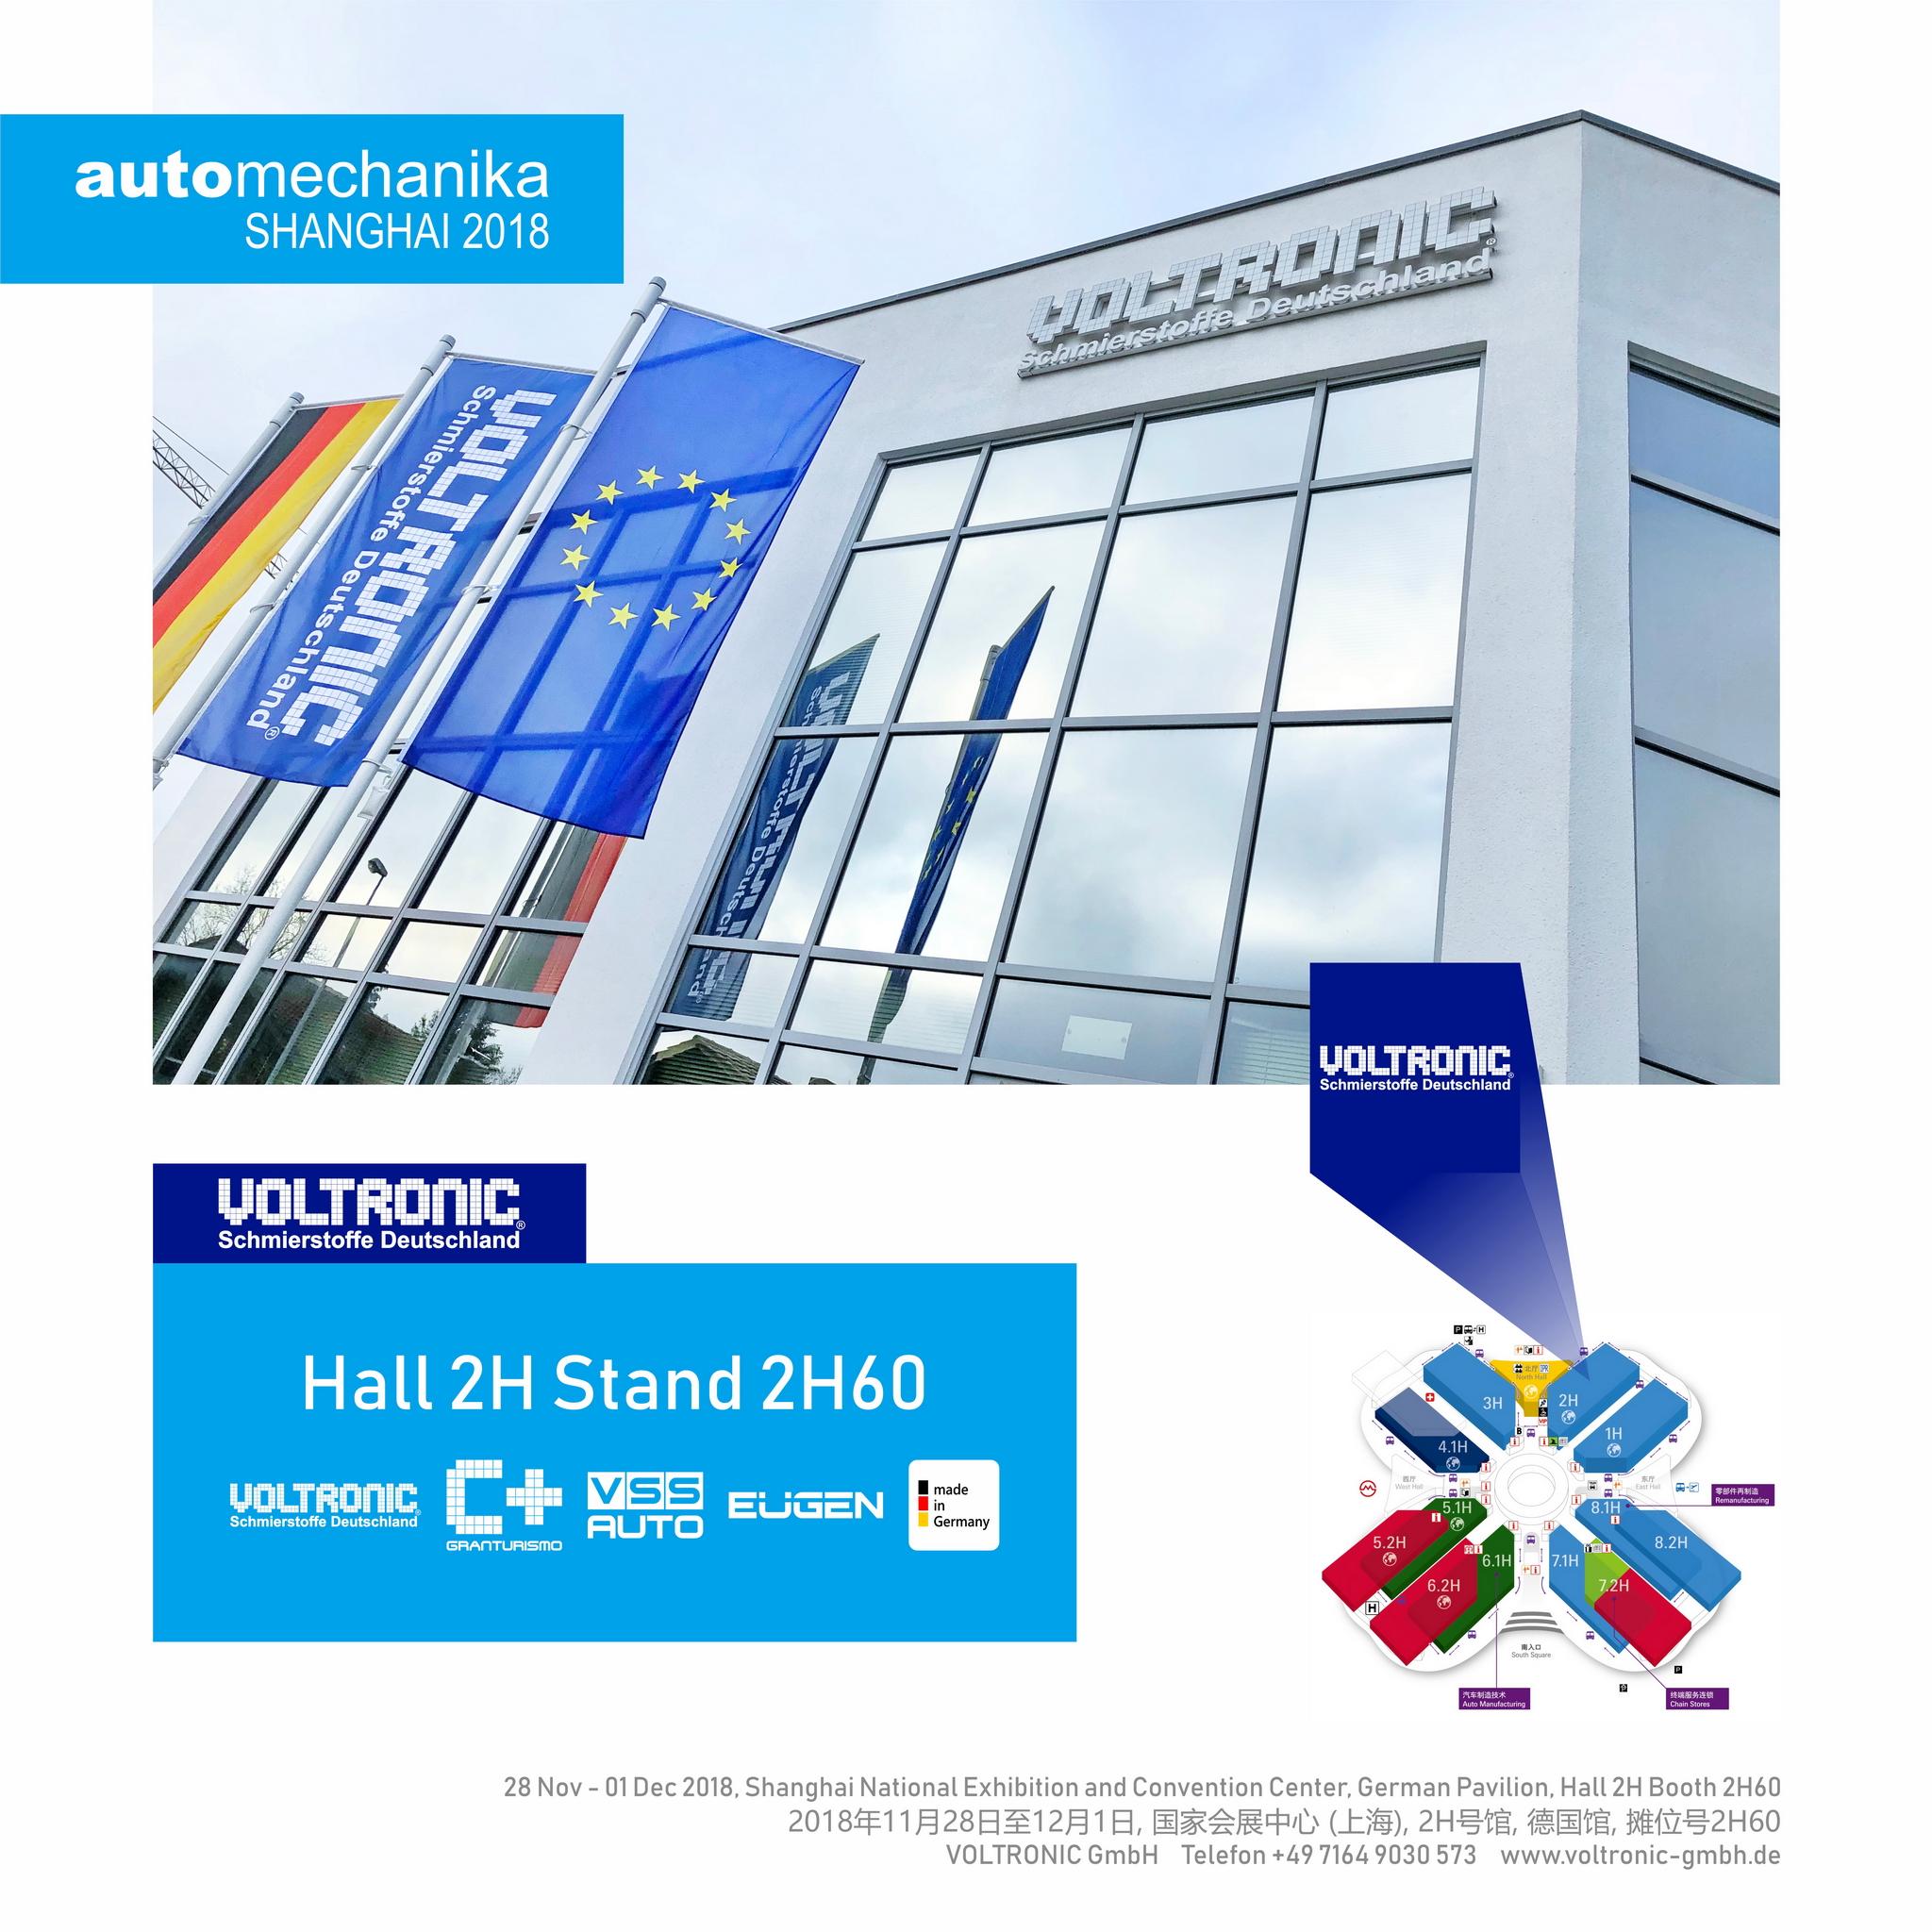 voltronic - automechanika shanghai 2018